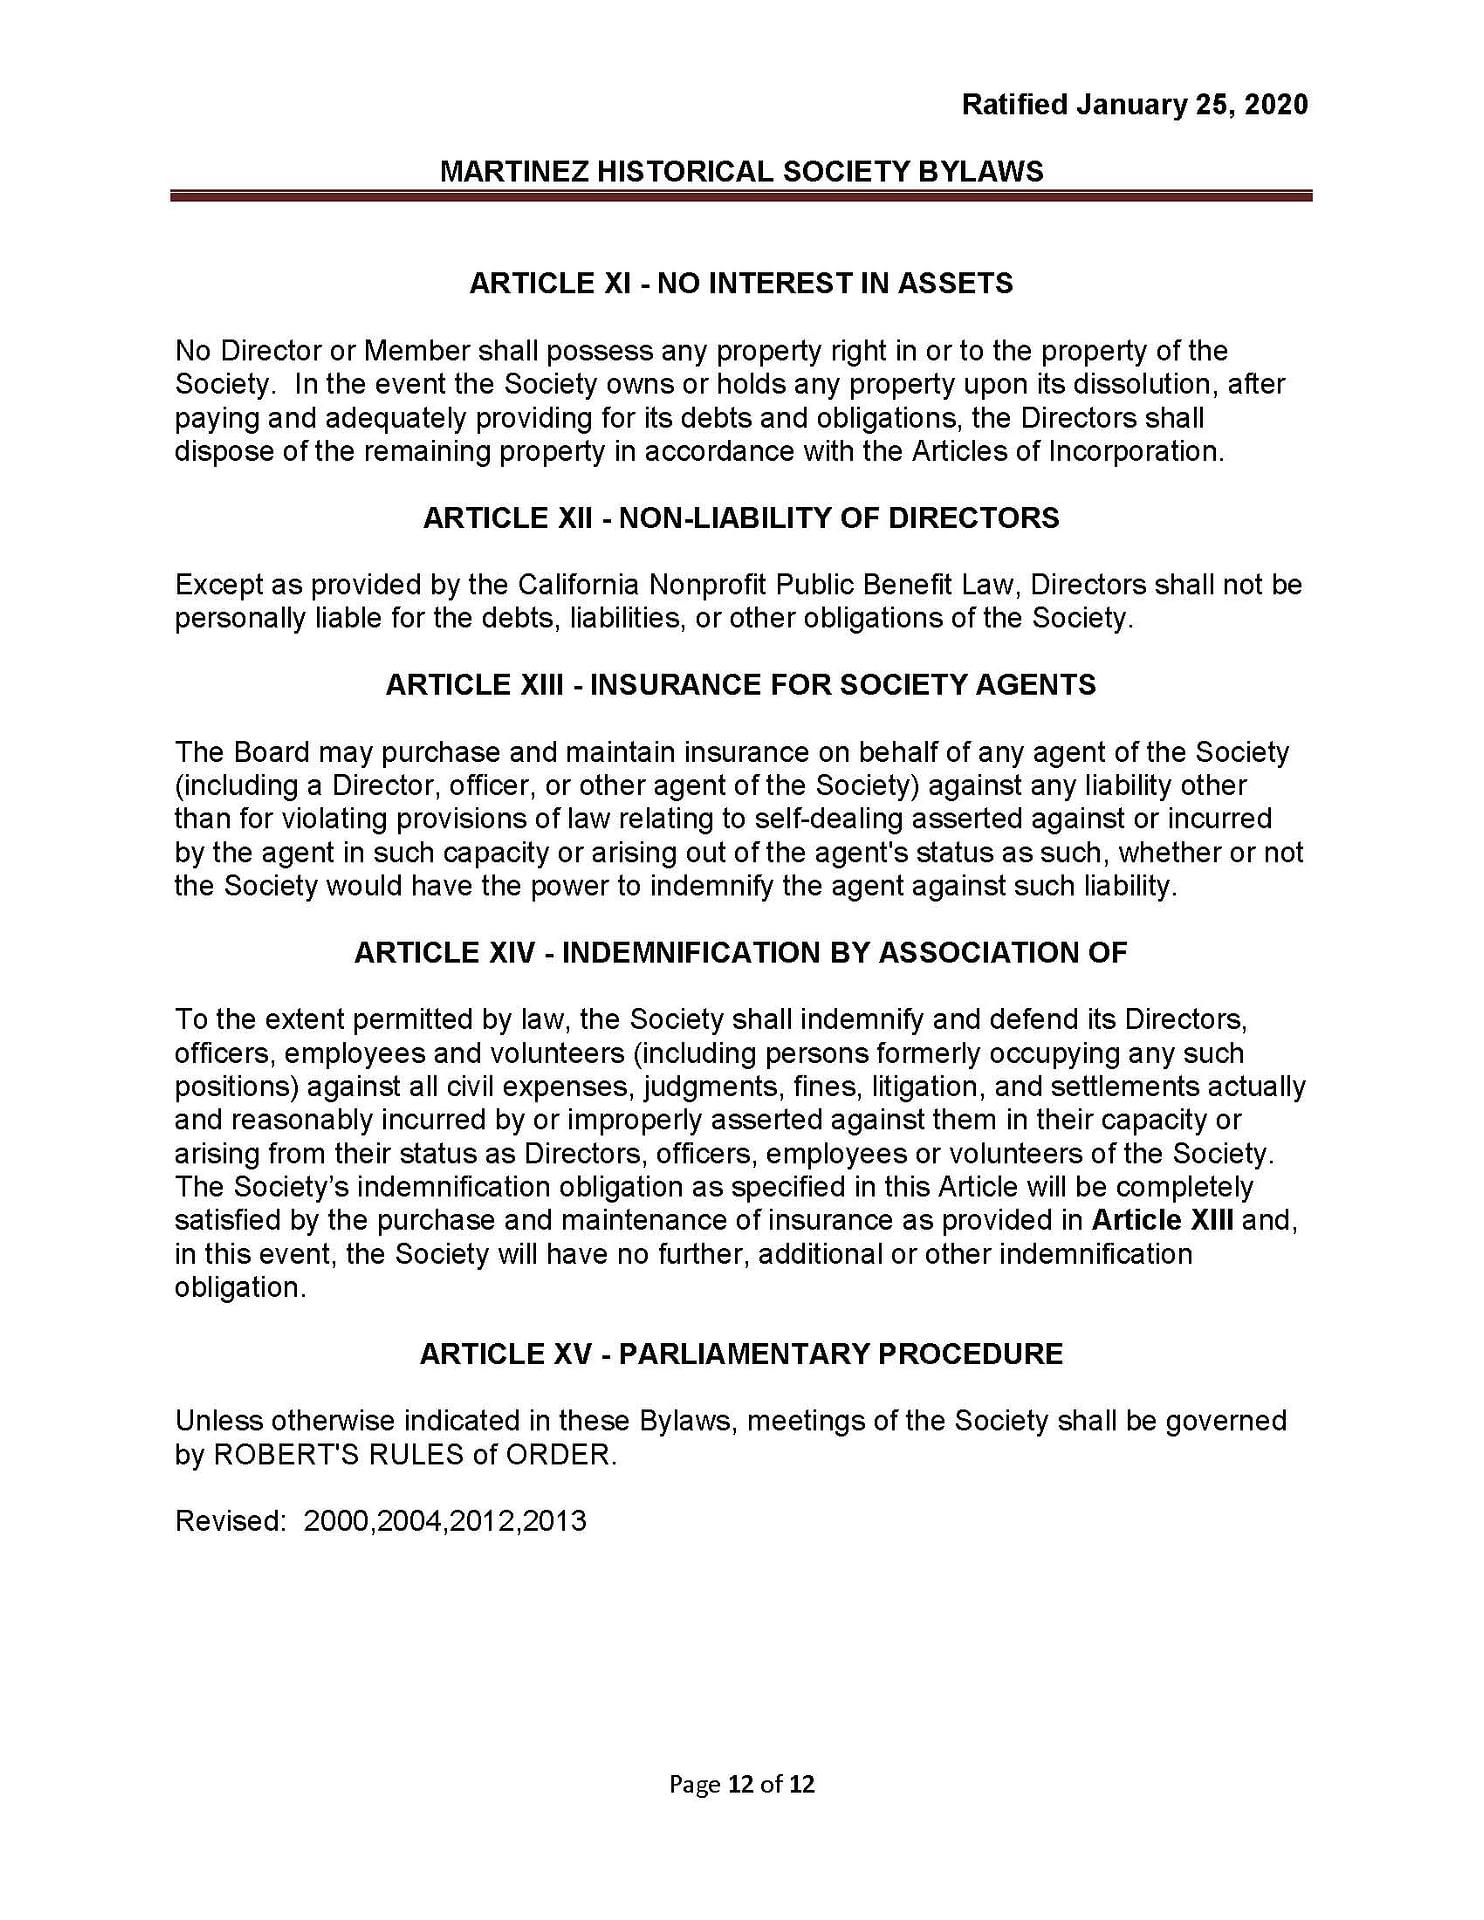 MHS Bylaws Rev 2020-01_Page_12